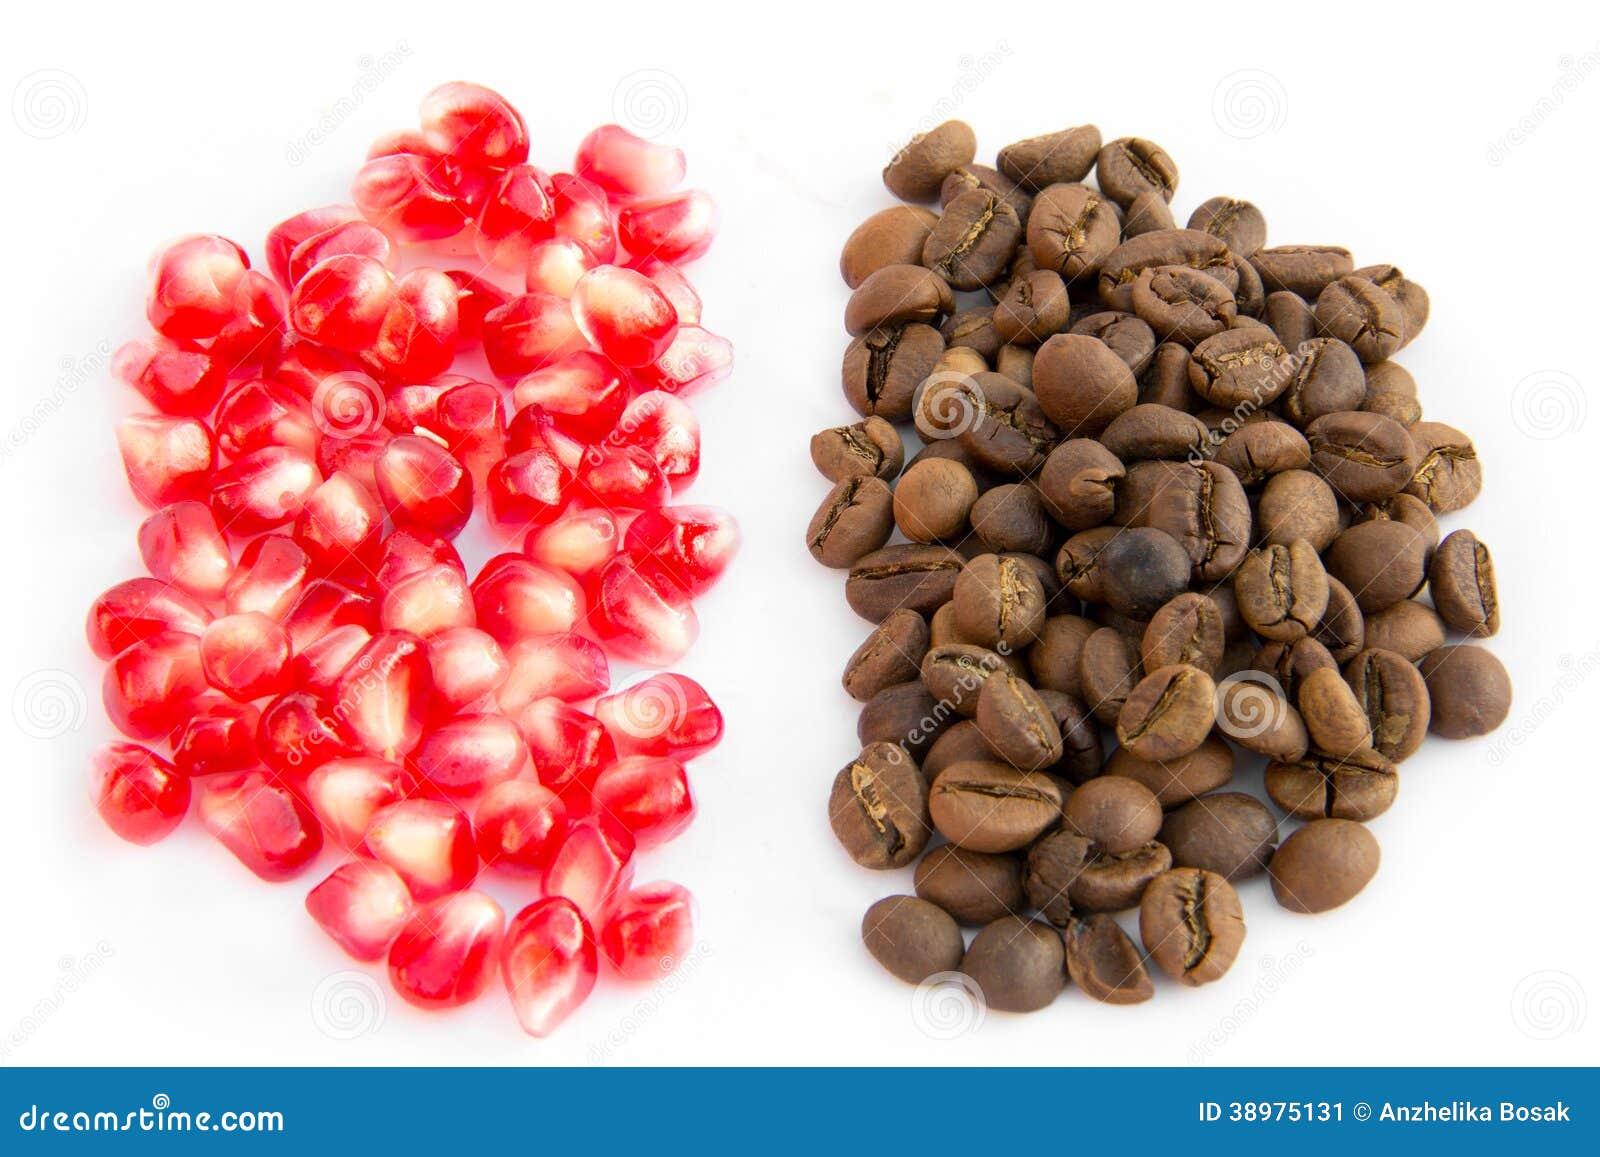 graines de caf et grains rouges de grenade image stock. Black Bedroom Furniture Sets. Home Design Ideas